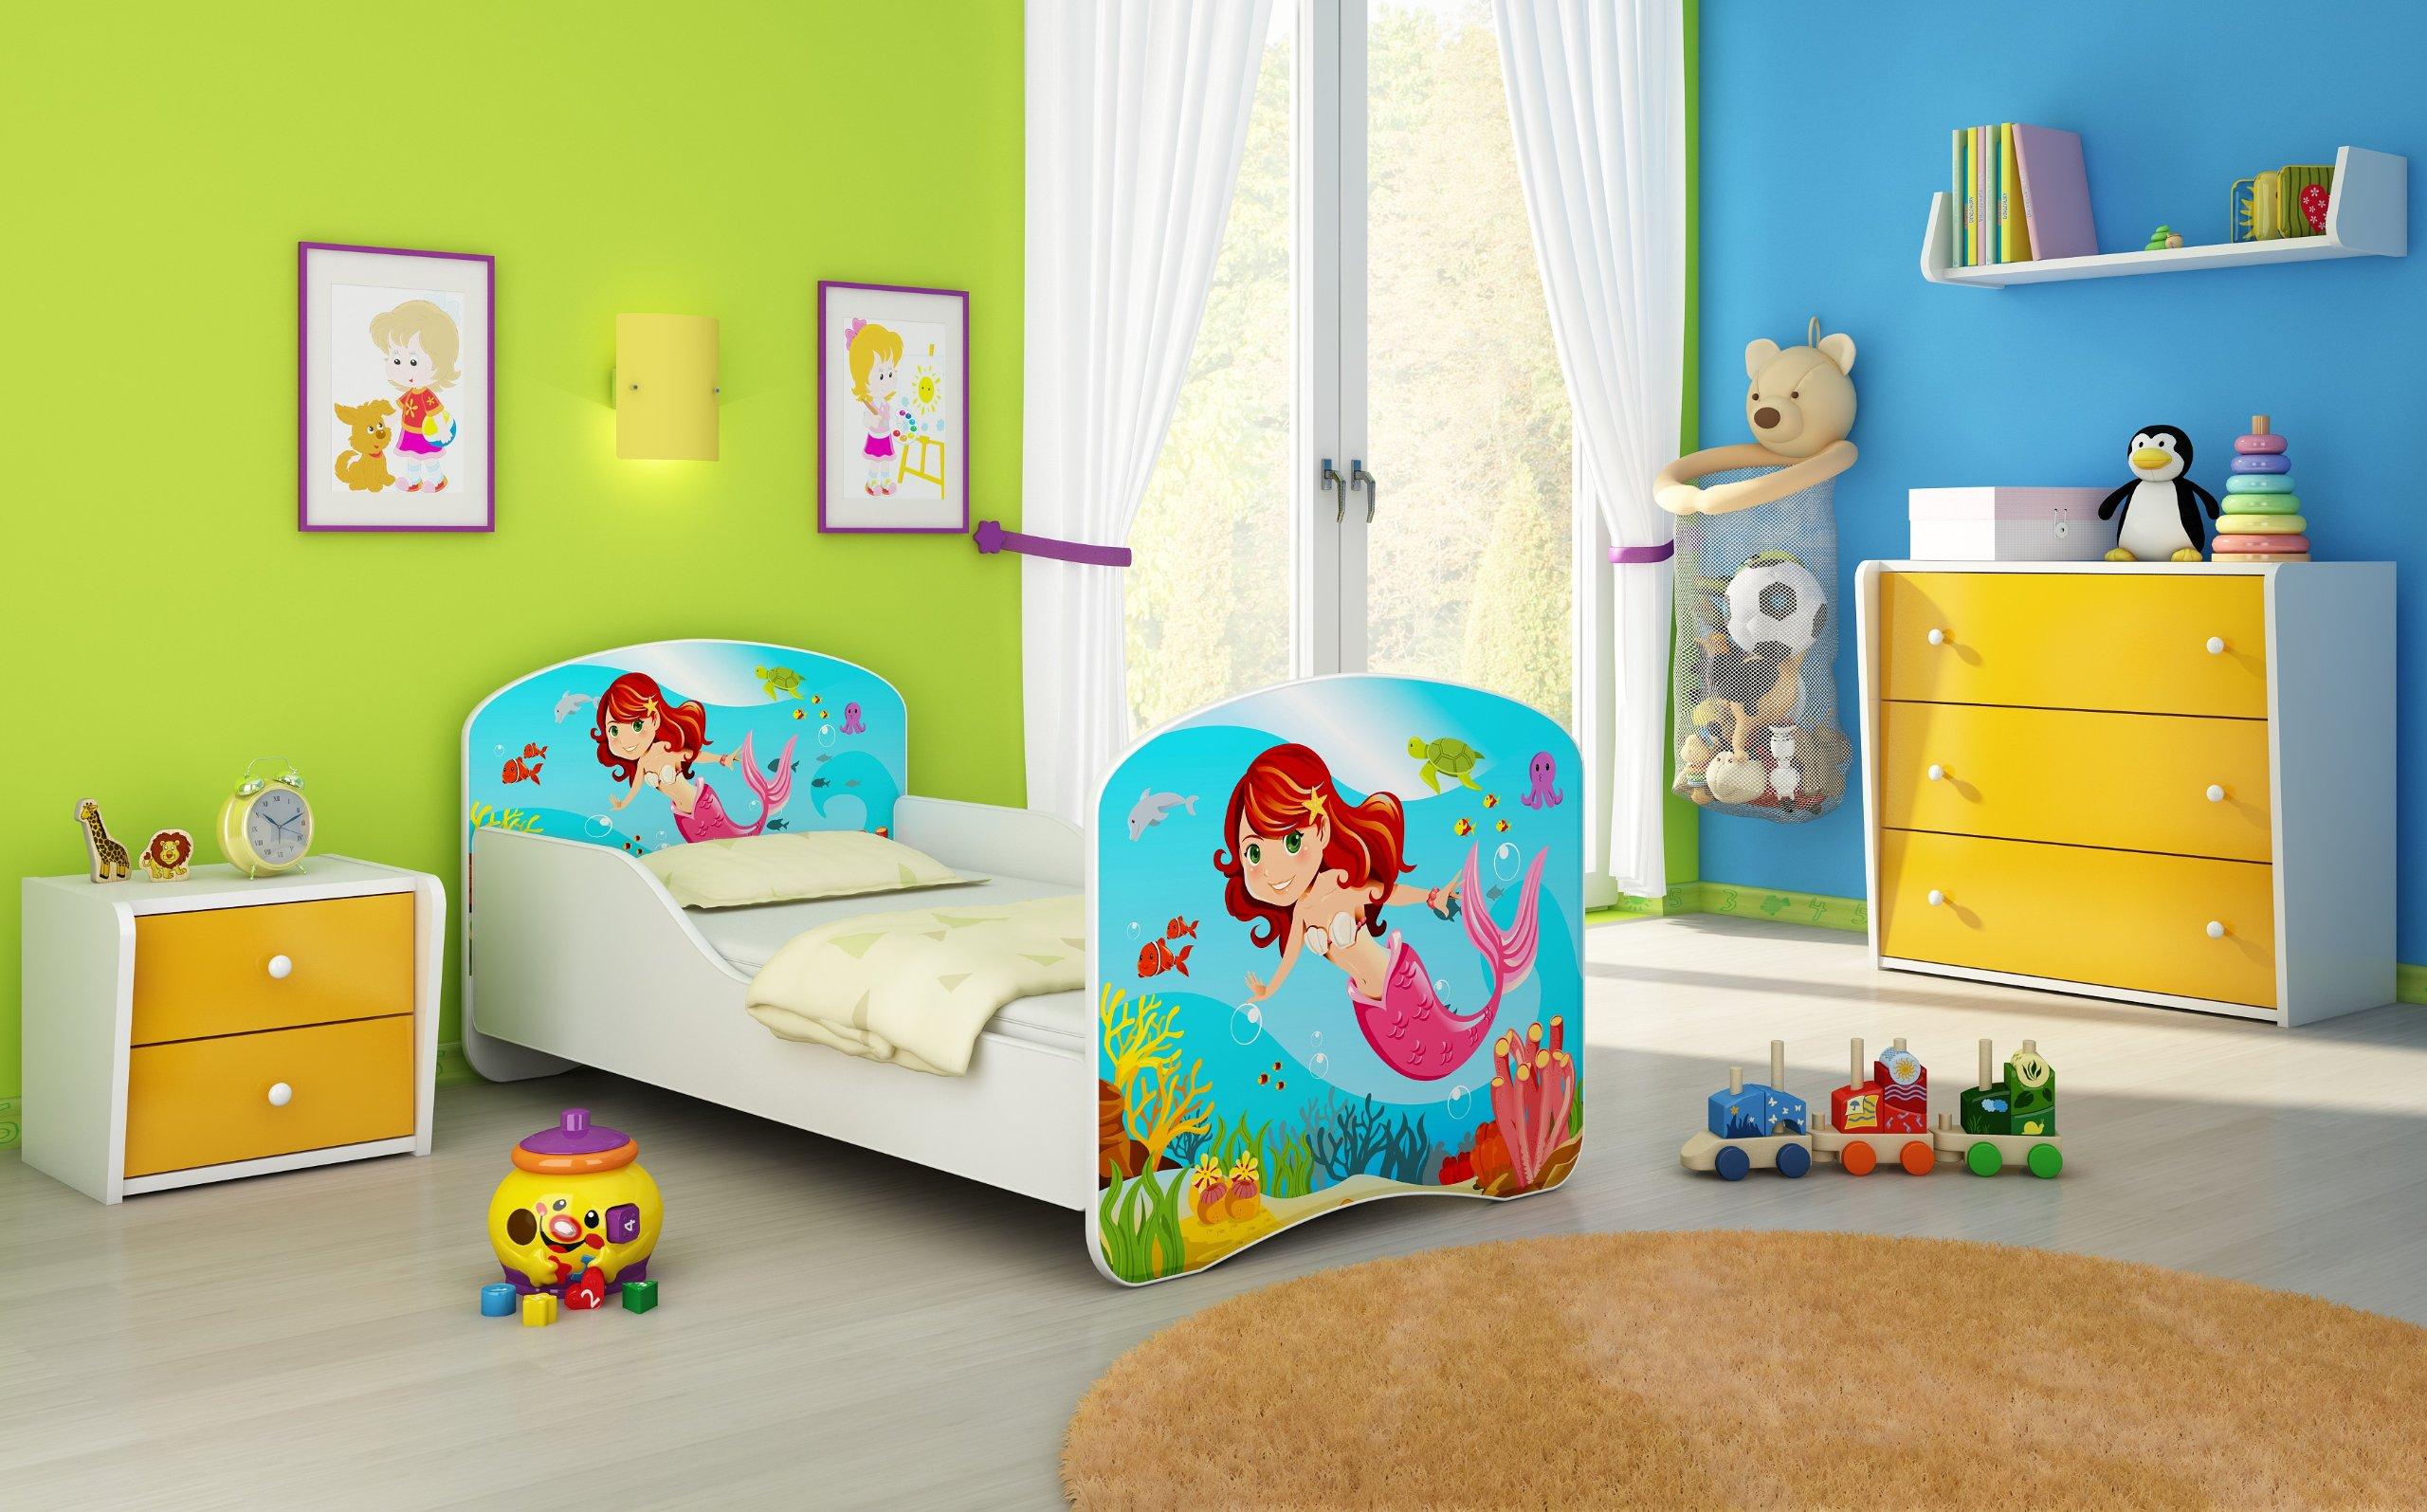 CHILDREN TODDLER KIDS BED + FREE MATTRESS ACMA I WHITE … 140x70 160x80 180x80 40 Designs (09 Mermaid, 180x80 cm) ACMA  1